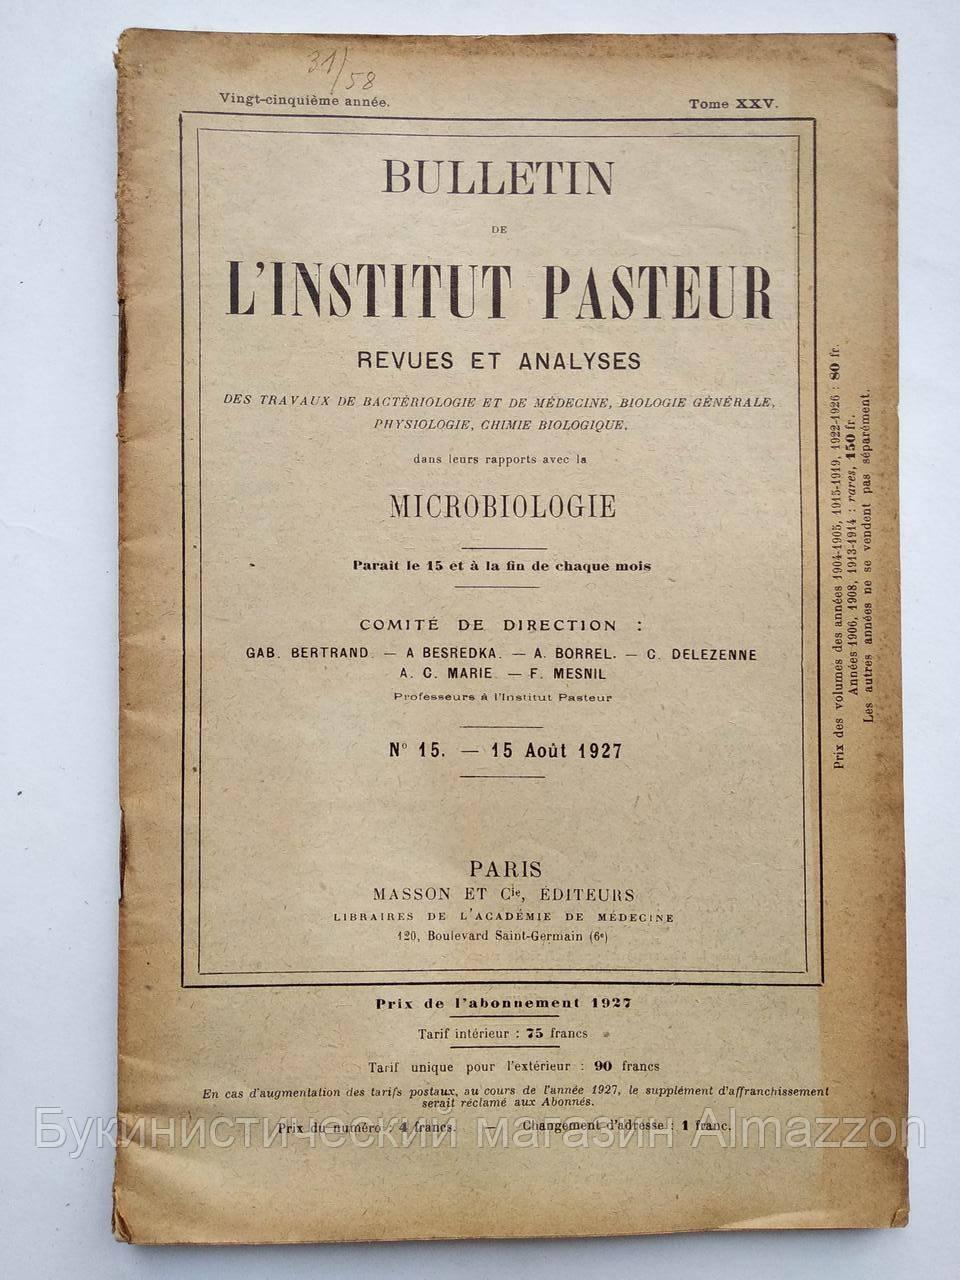 1927 Bulletin L`Institut Pasteur Microbiologie Paris. Микробиология Реклама. Институт Пастера в Париже